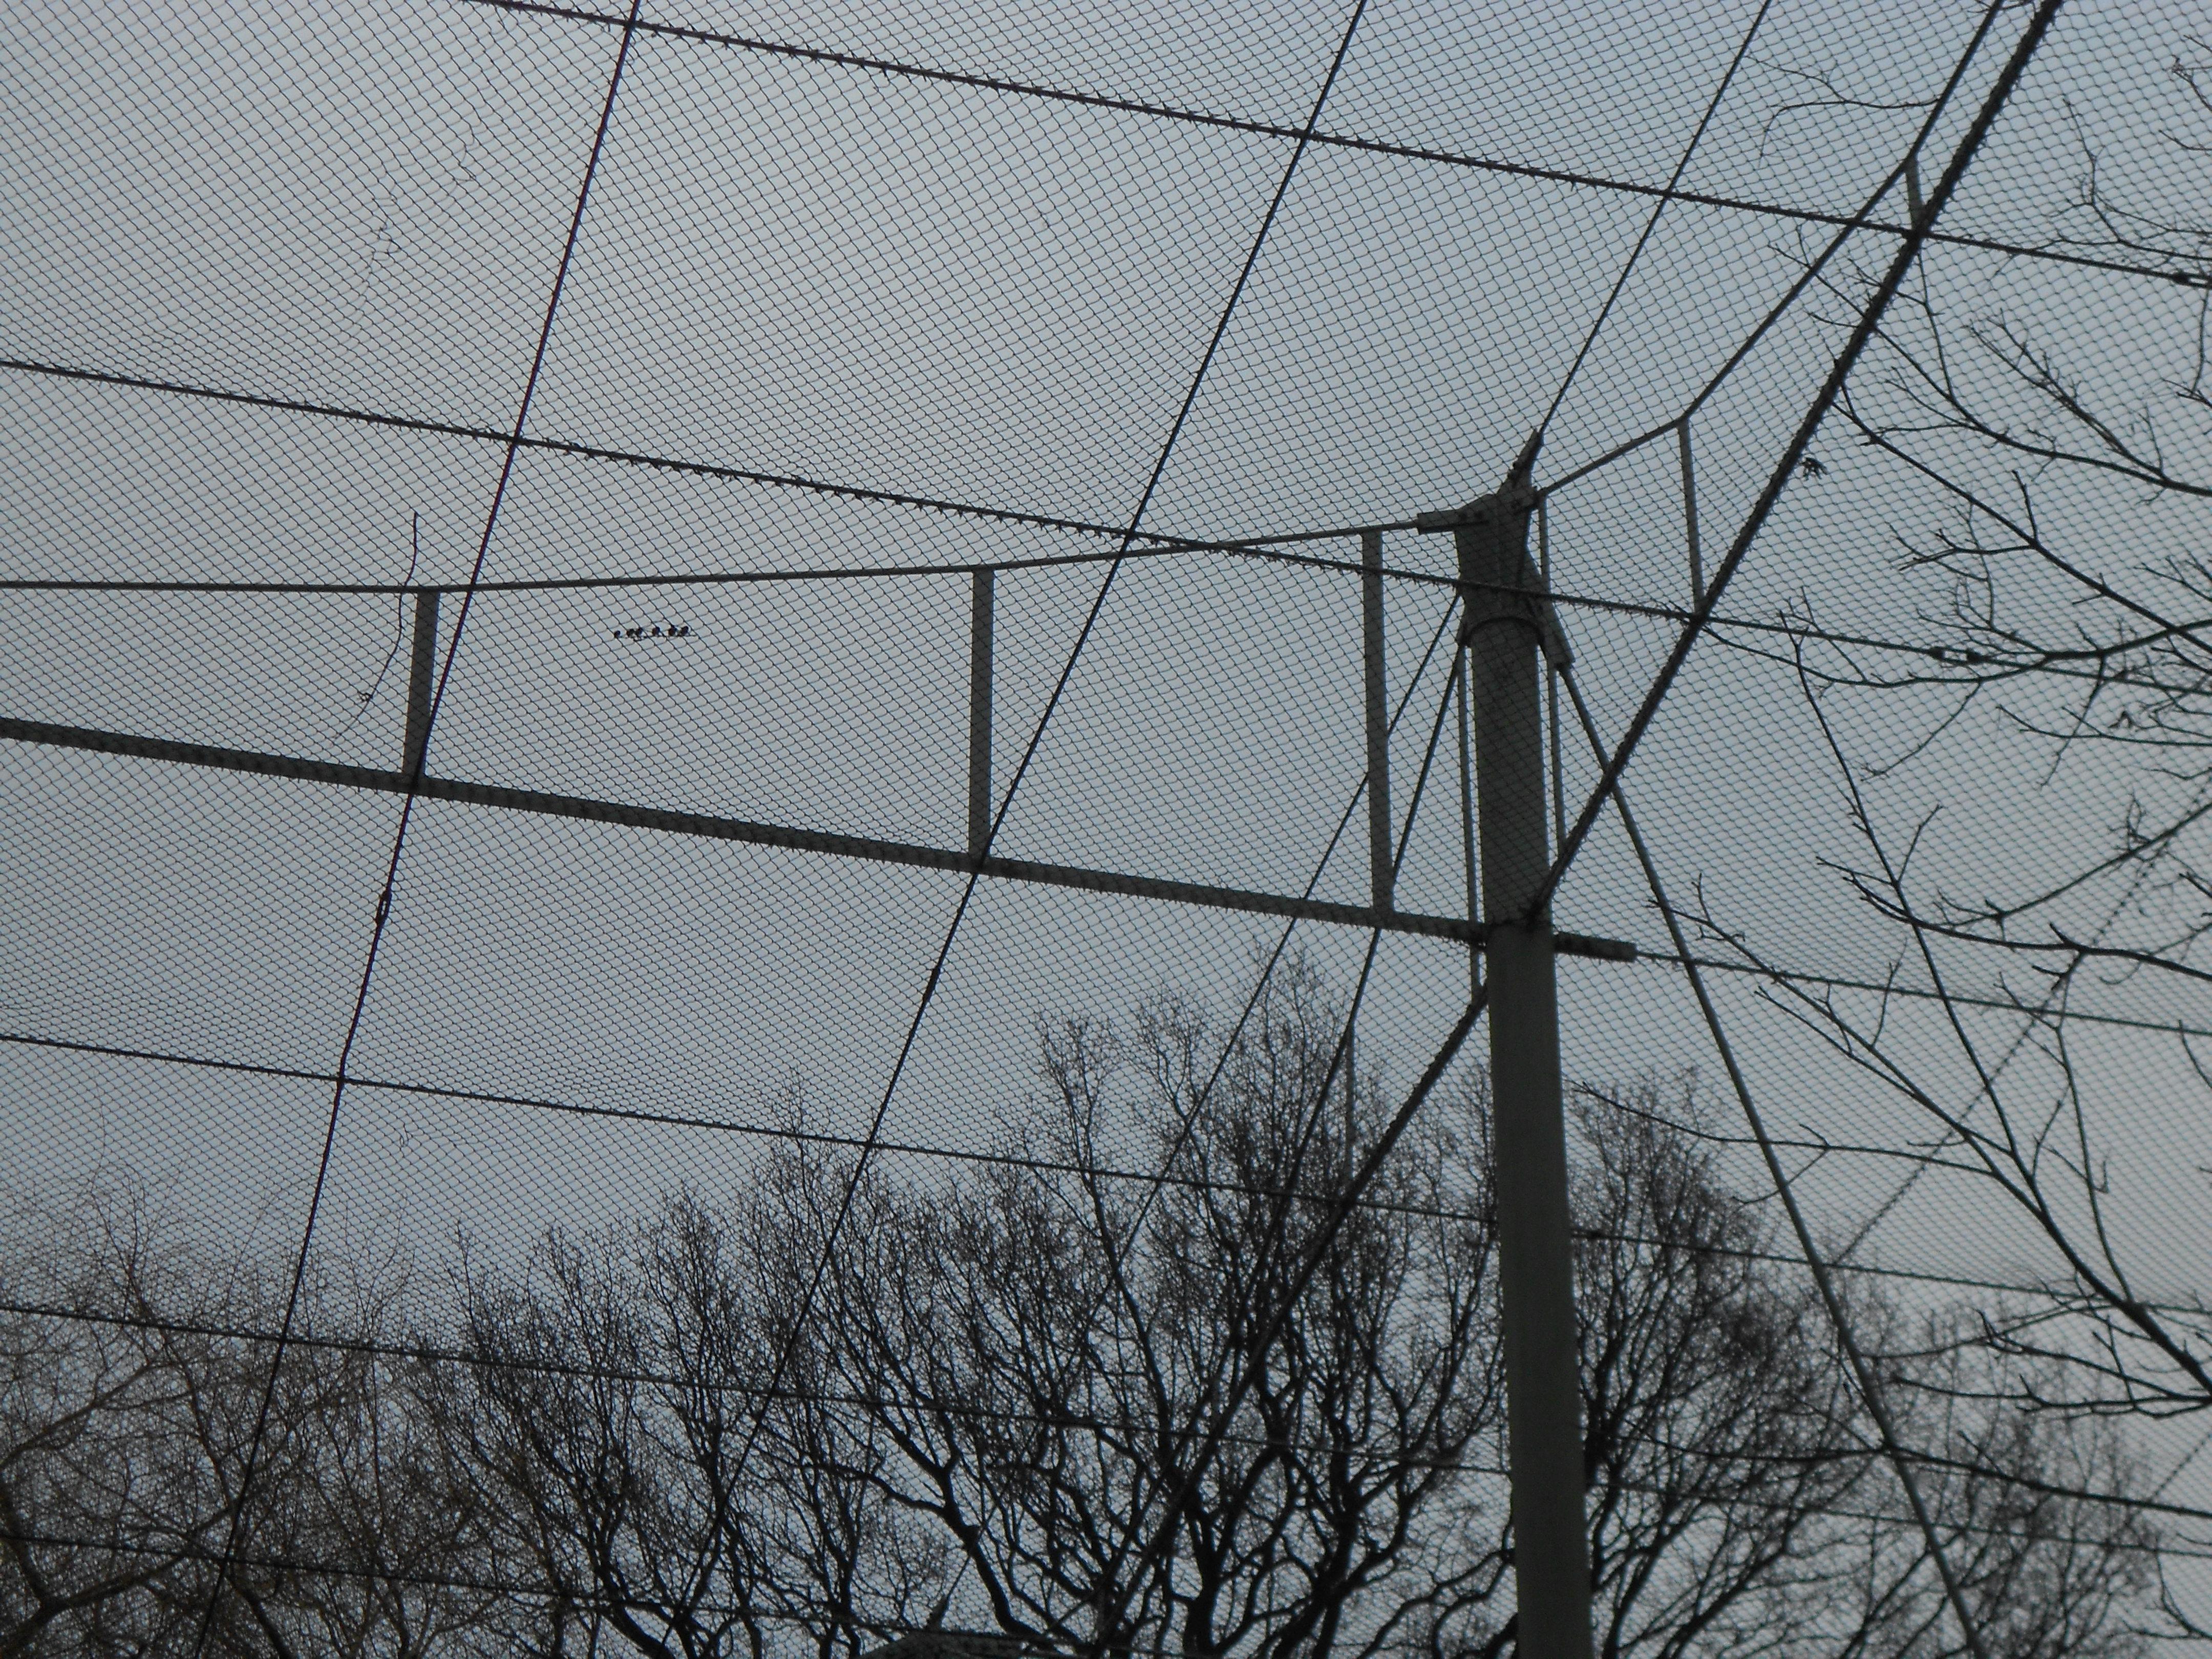 Dierenpark Emmen - American Free-flight aviary(4)